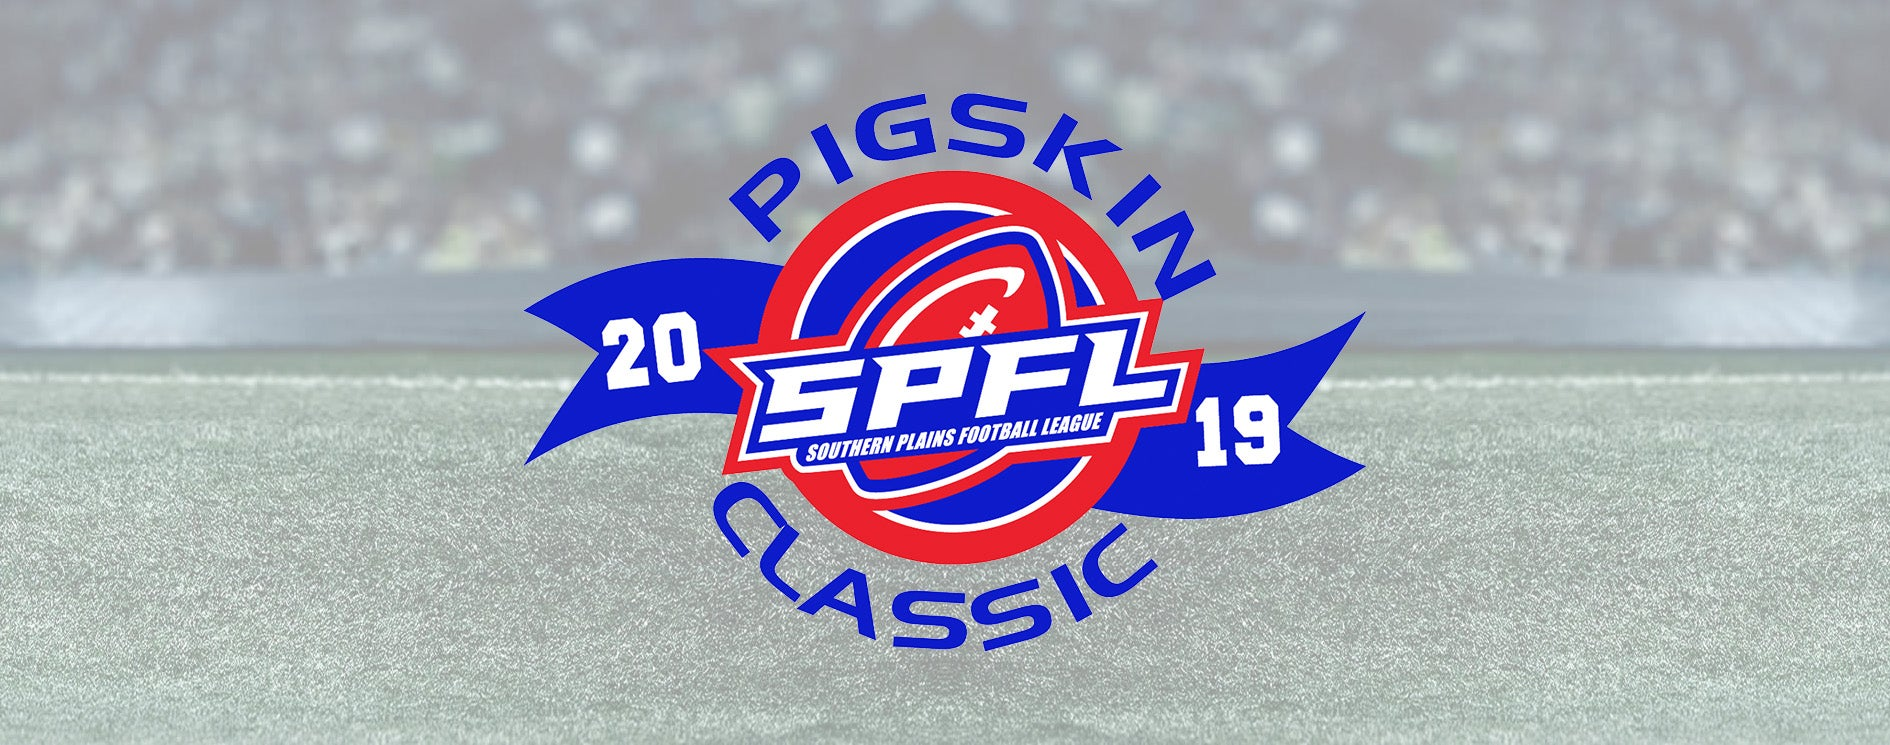 Southern Plains Football League Winter Pigskin Classic